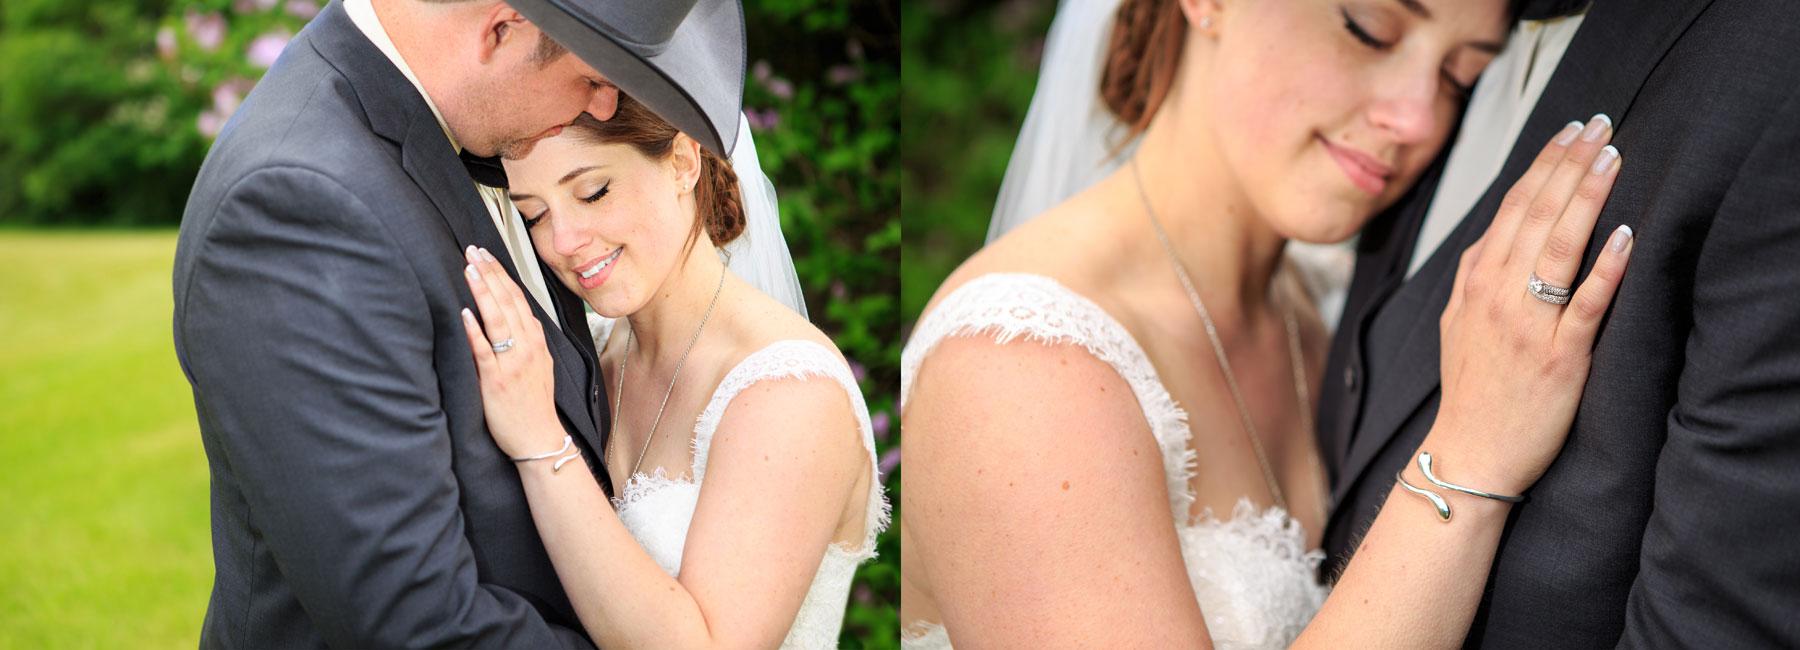 Angela & Patrick - Lacombe, Alberta Wedding Photography - Olson Studios (23)